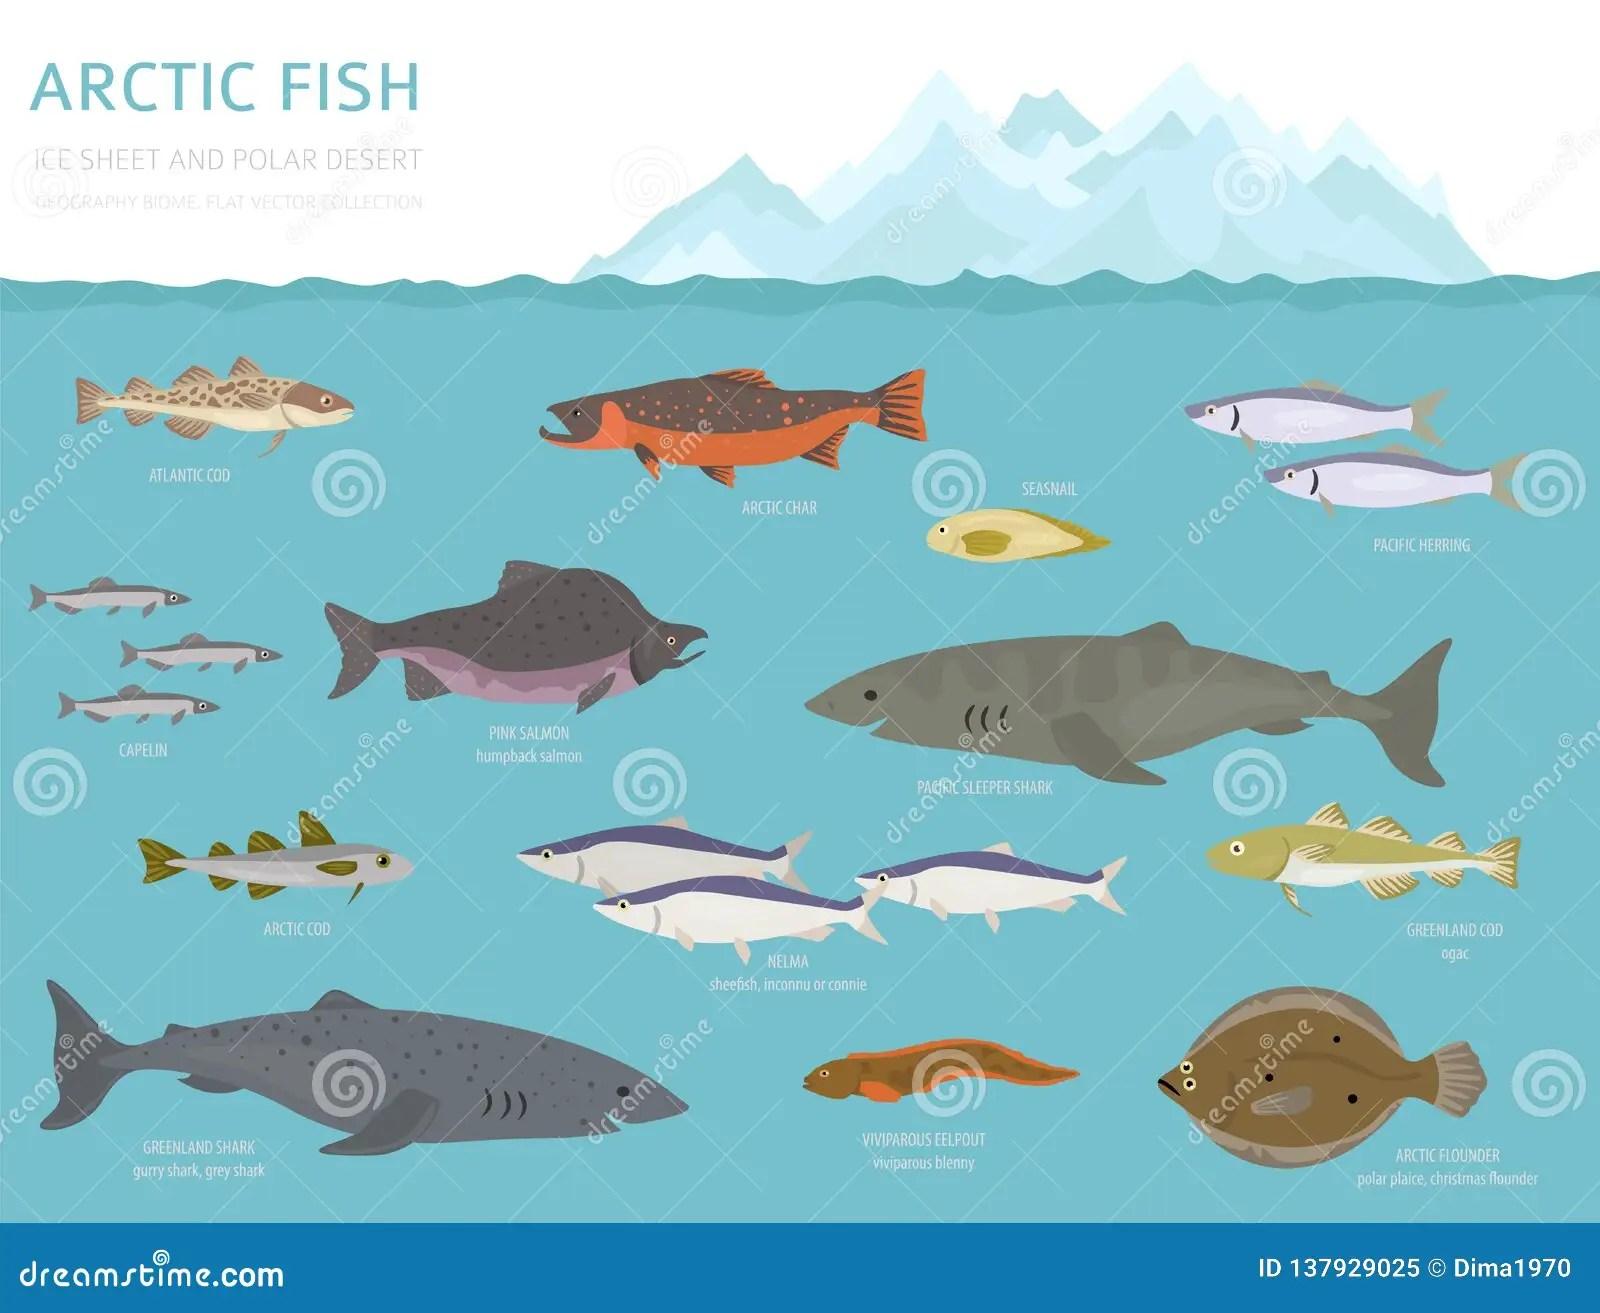 Ice Sheet And Polar Desert Biome Terrestrial Ecosystem